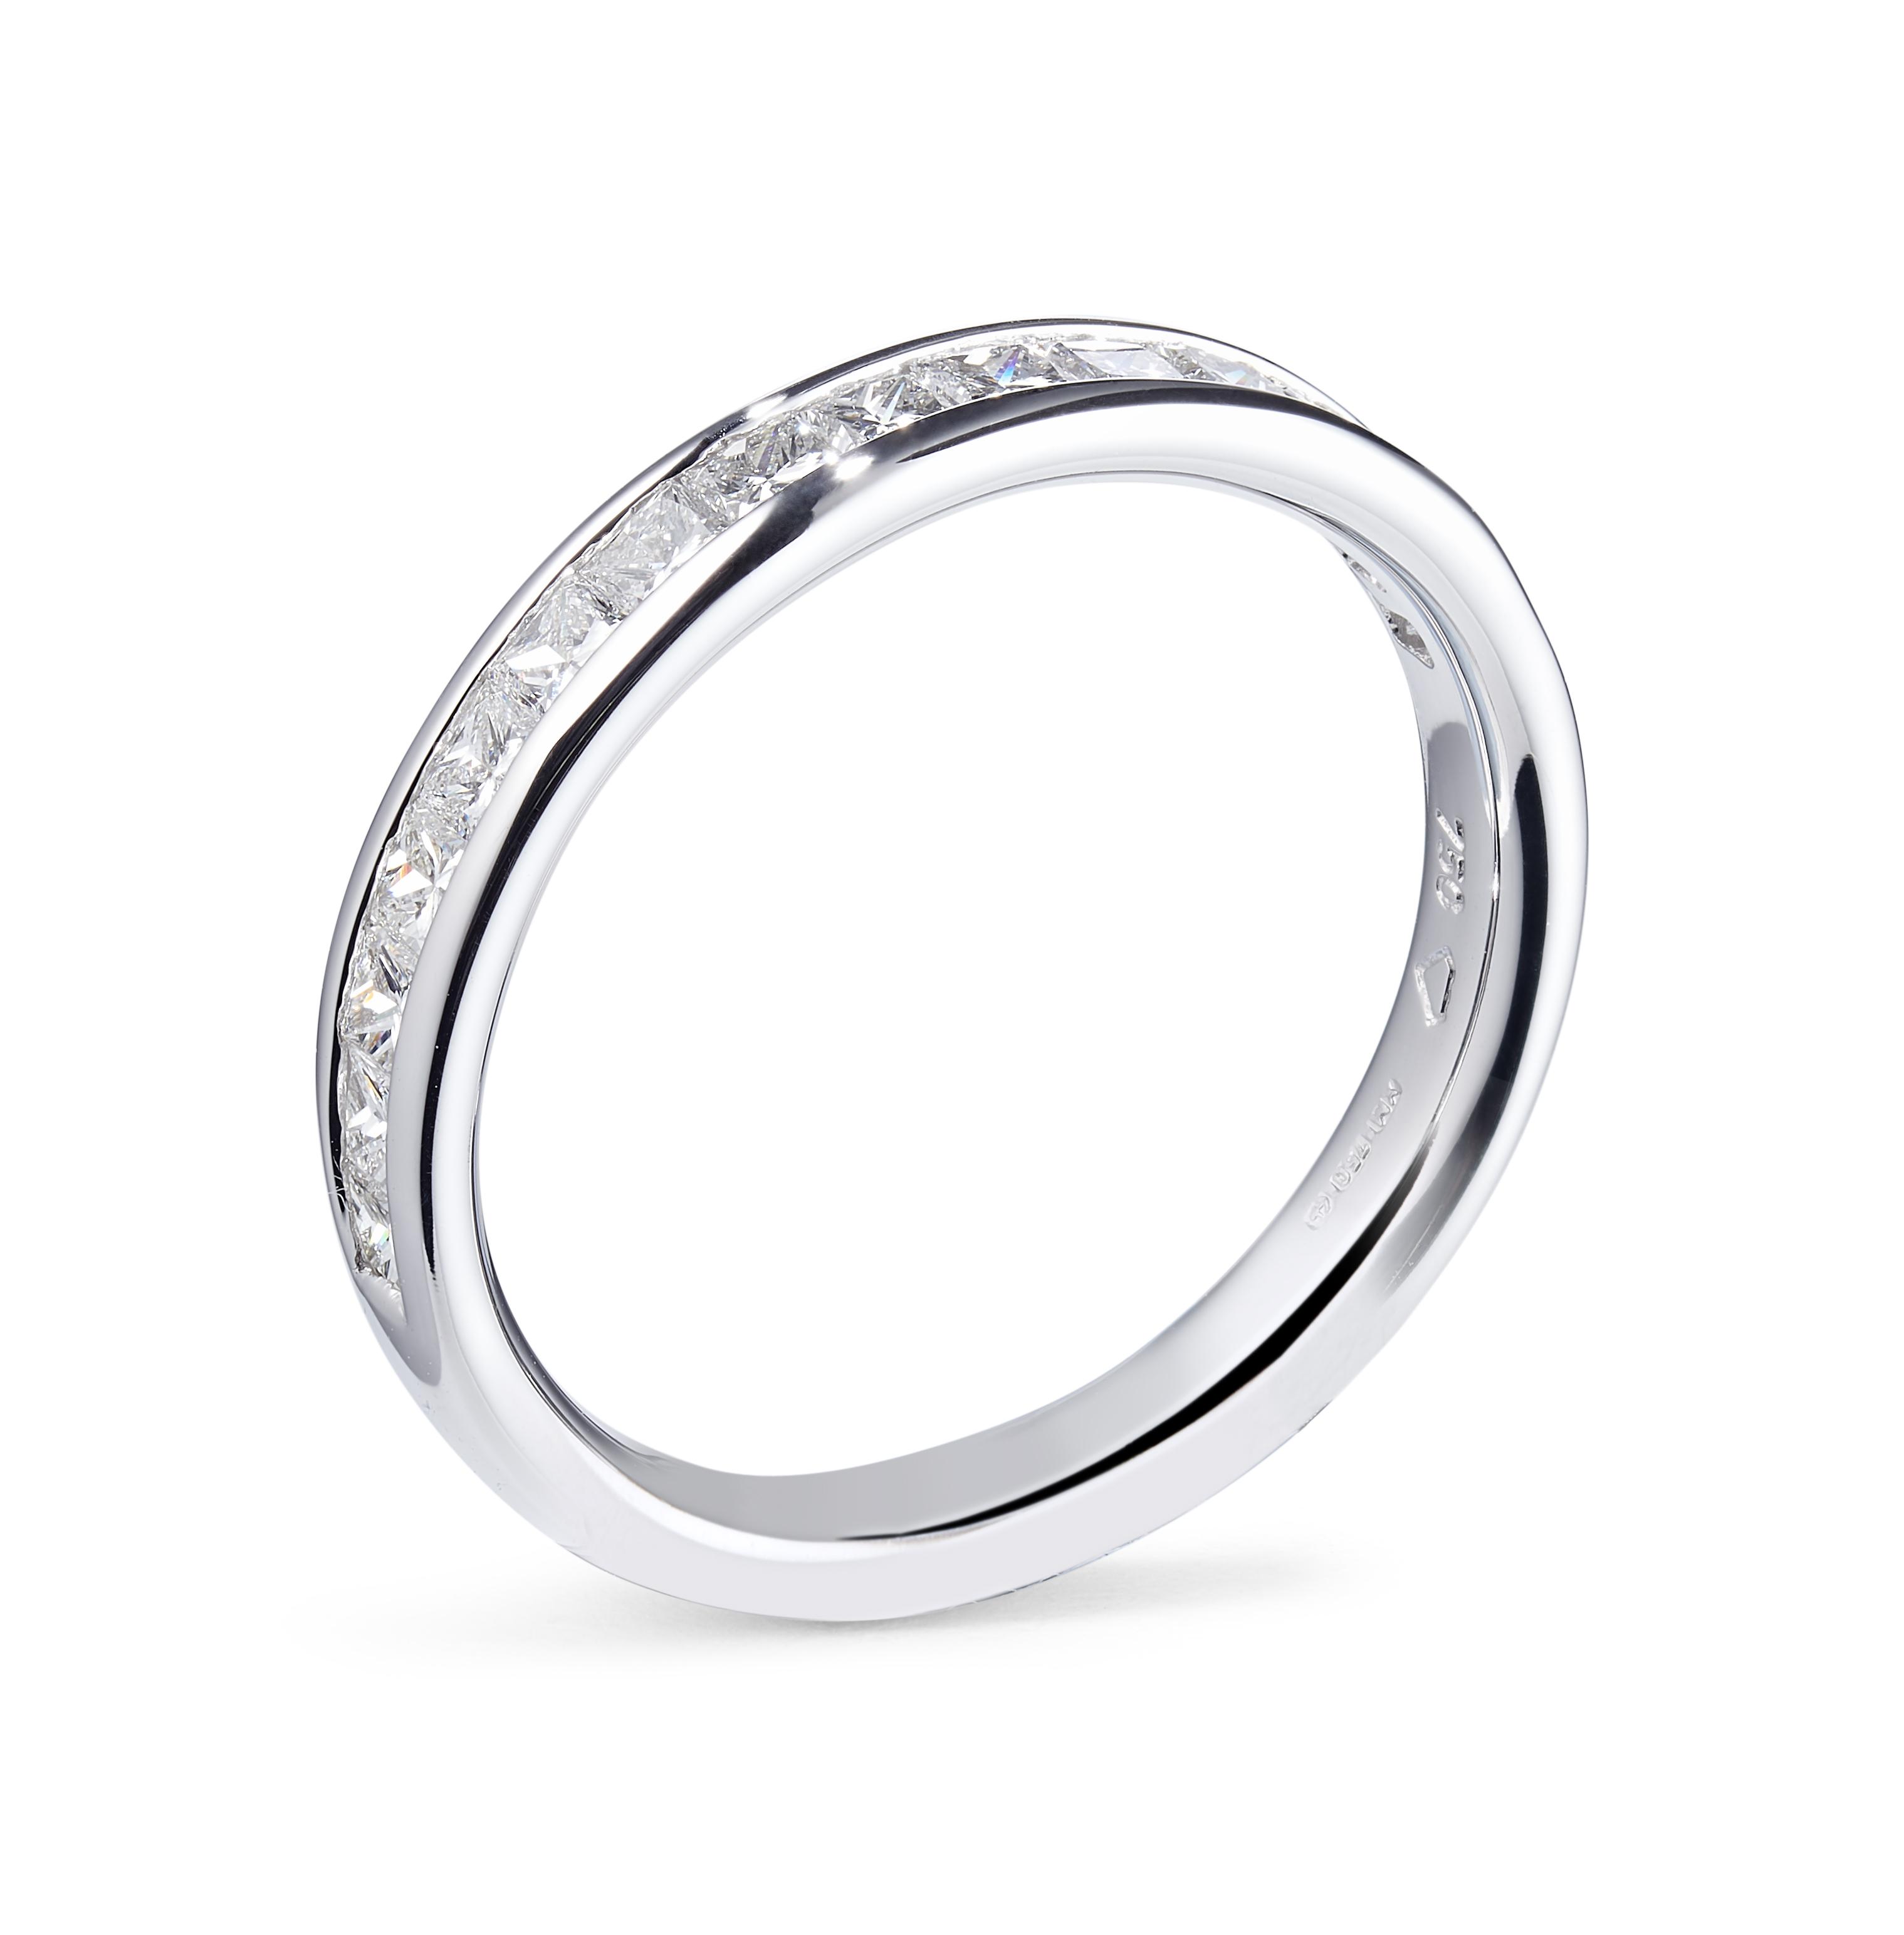 18ct 50% Grain Set Brilliant Cut Diamond Ring